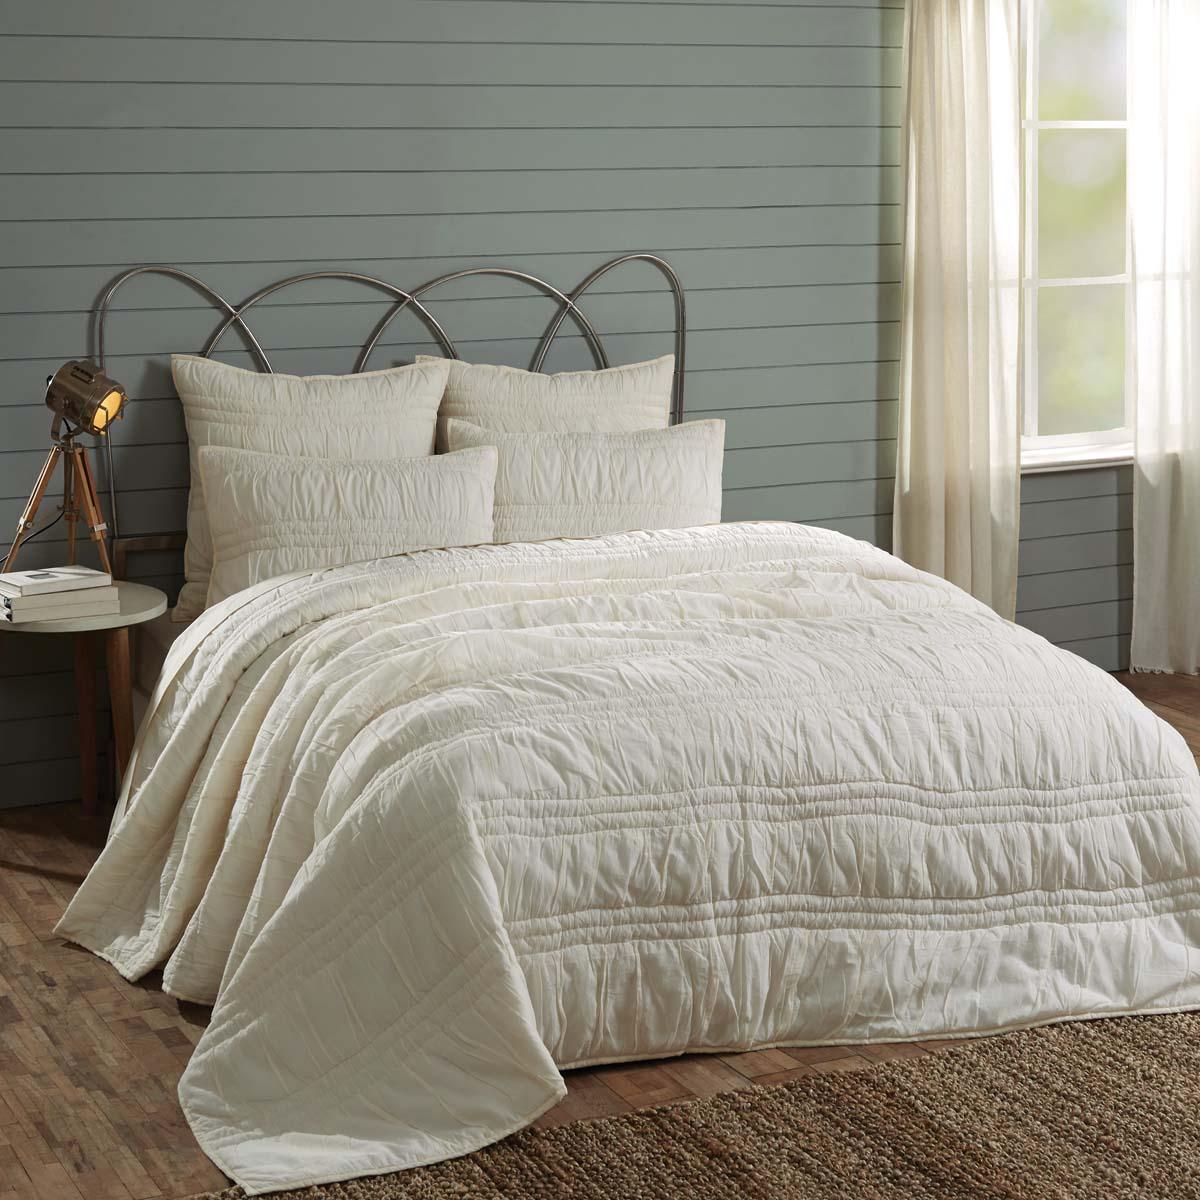 Natasha Pearl White King Set; Quilt 105Wx95L-2 Shams 21x37